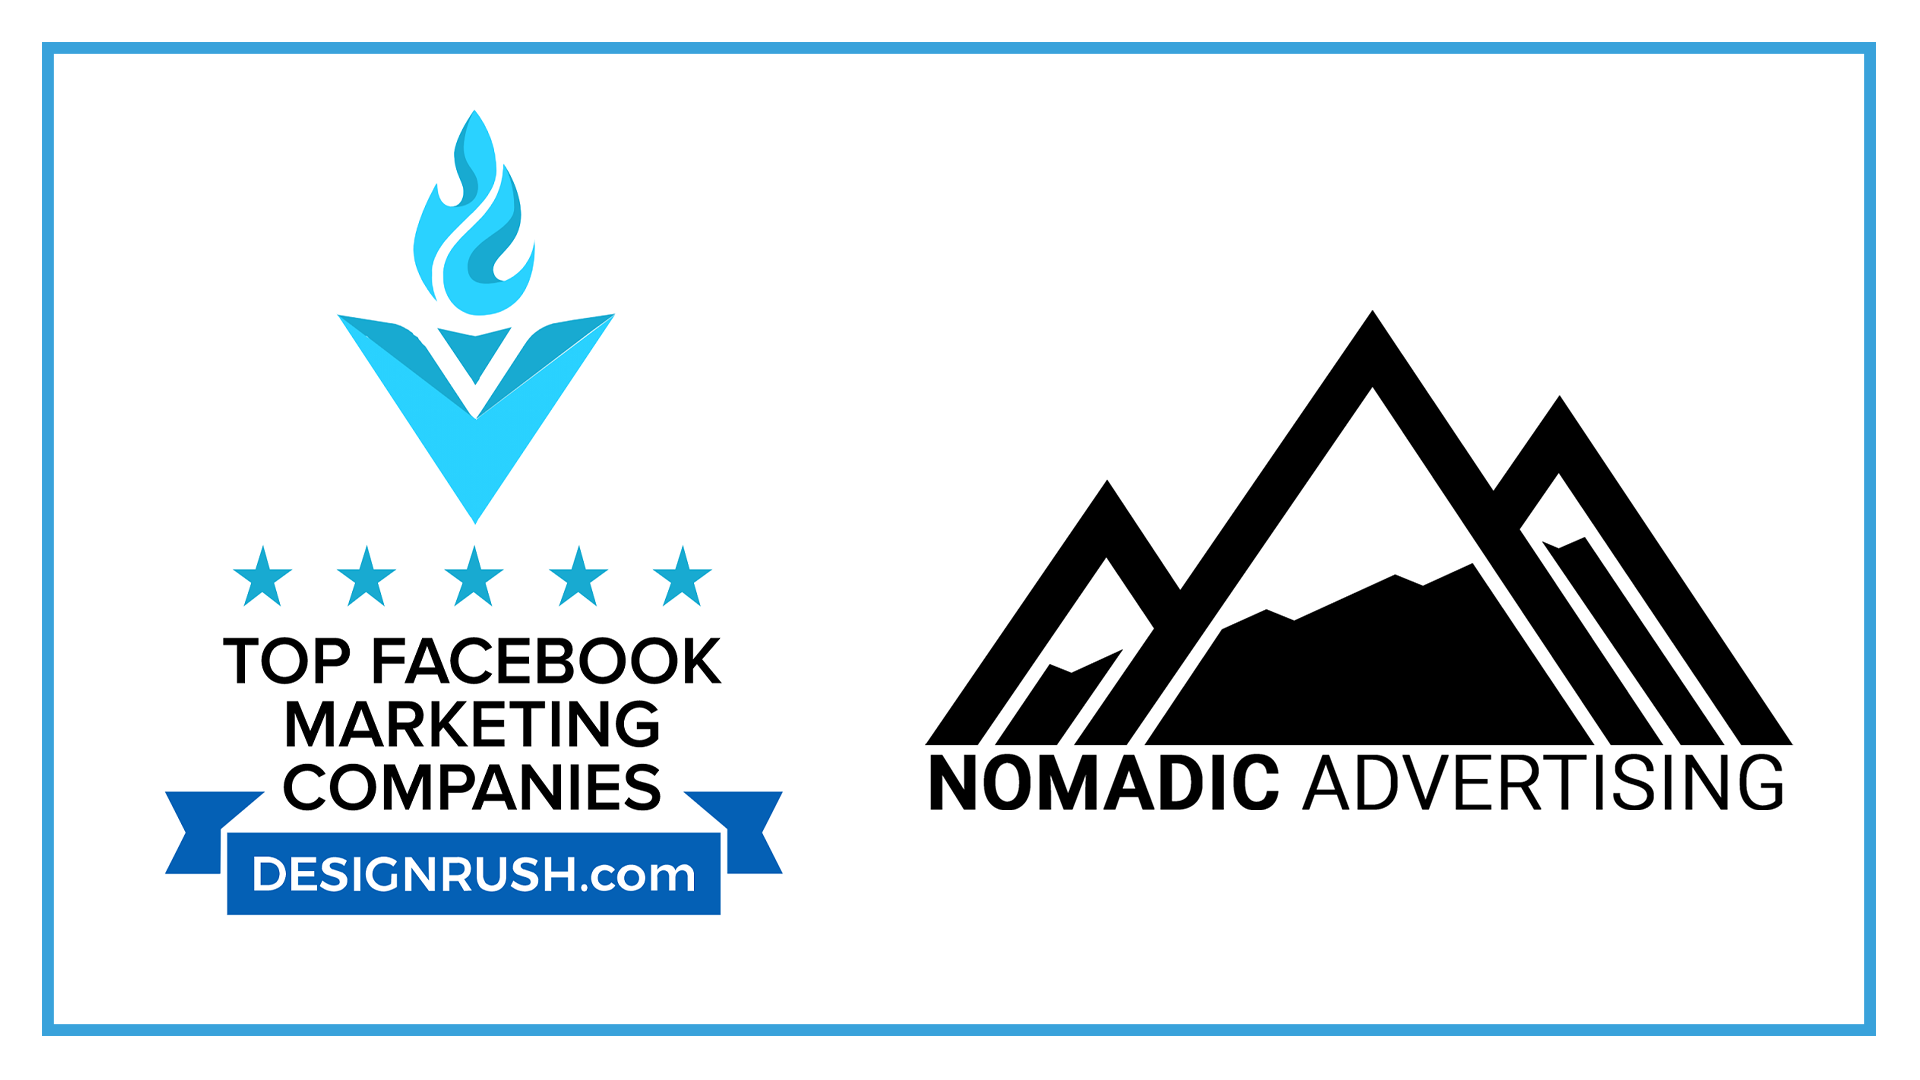 Nomadic Advertising ranked as a top 30 Facebook marketing agency